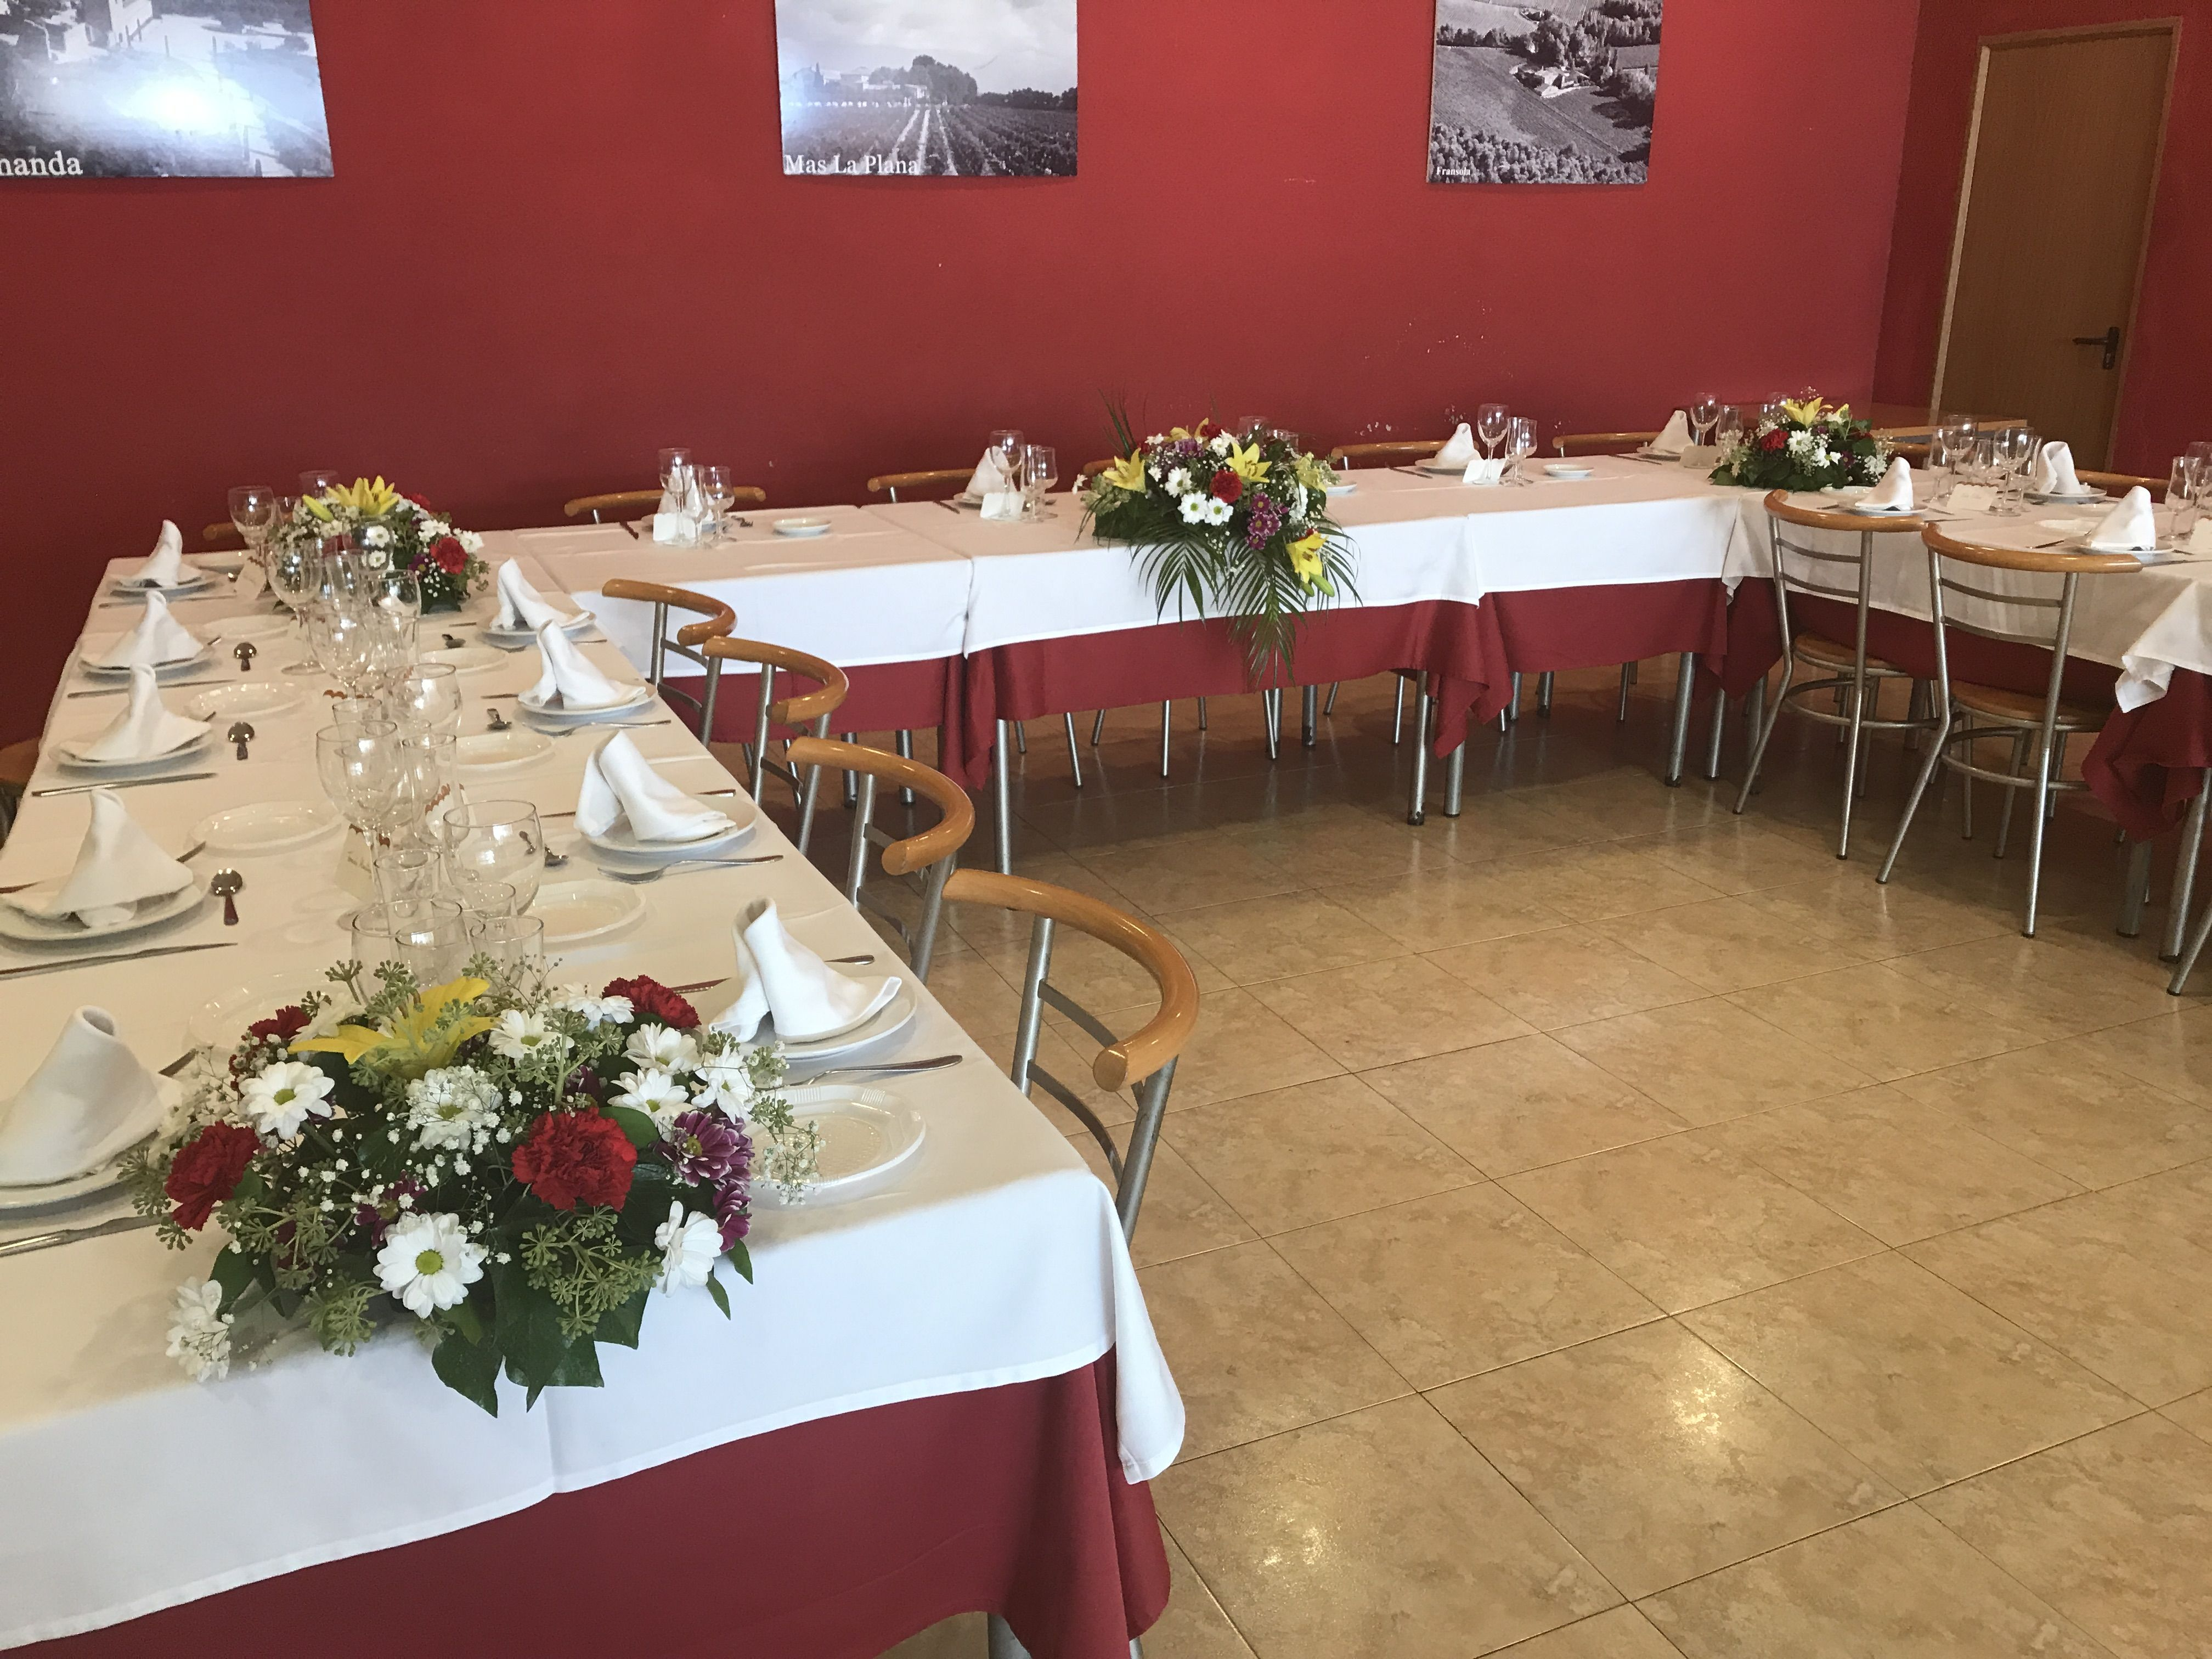 Salones para celebraciones Vilafranca del Penedès